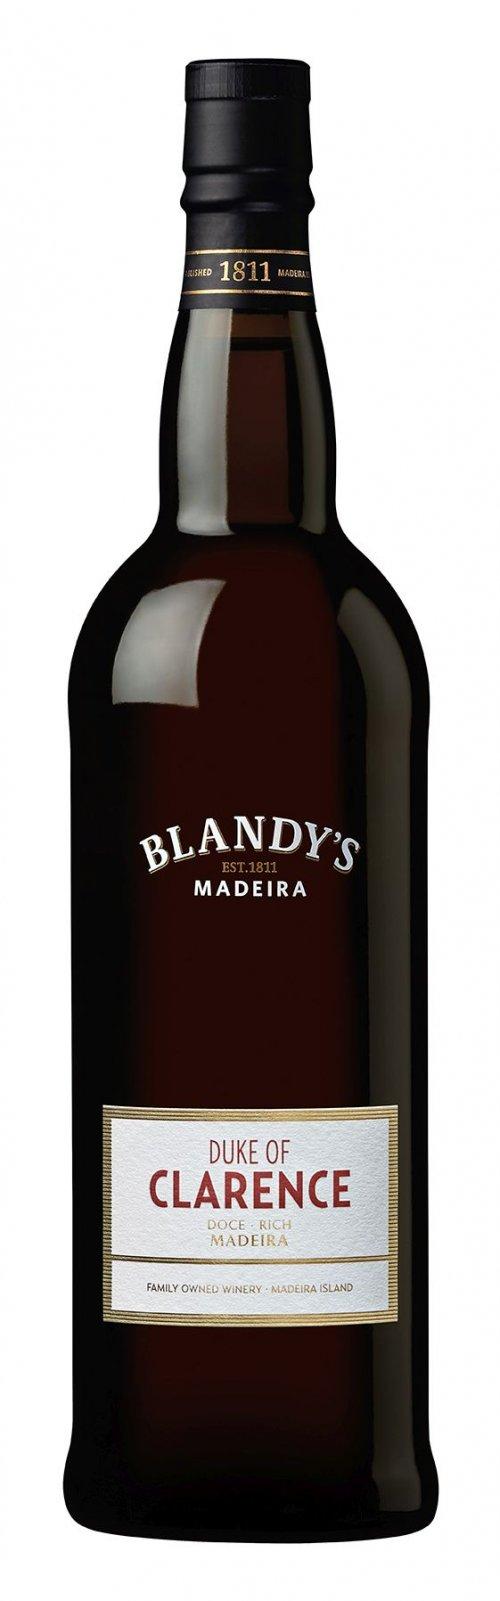 Blandy's Madeira Duke of Clarence Rich 0,75L, fortvin, bl, sl